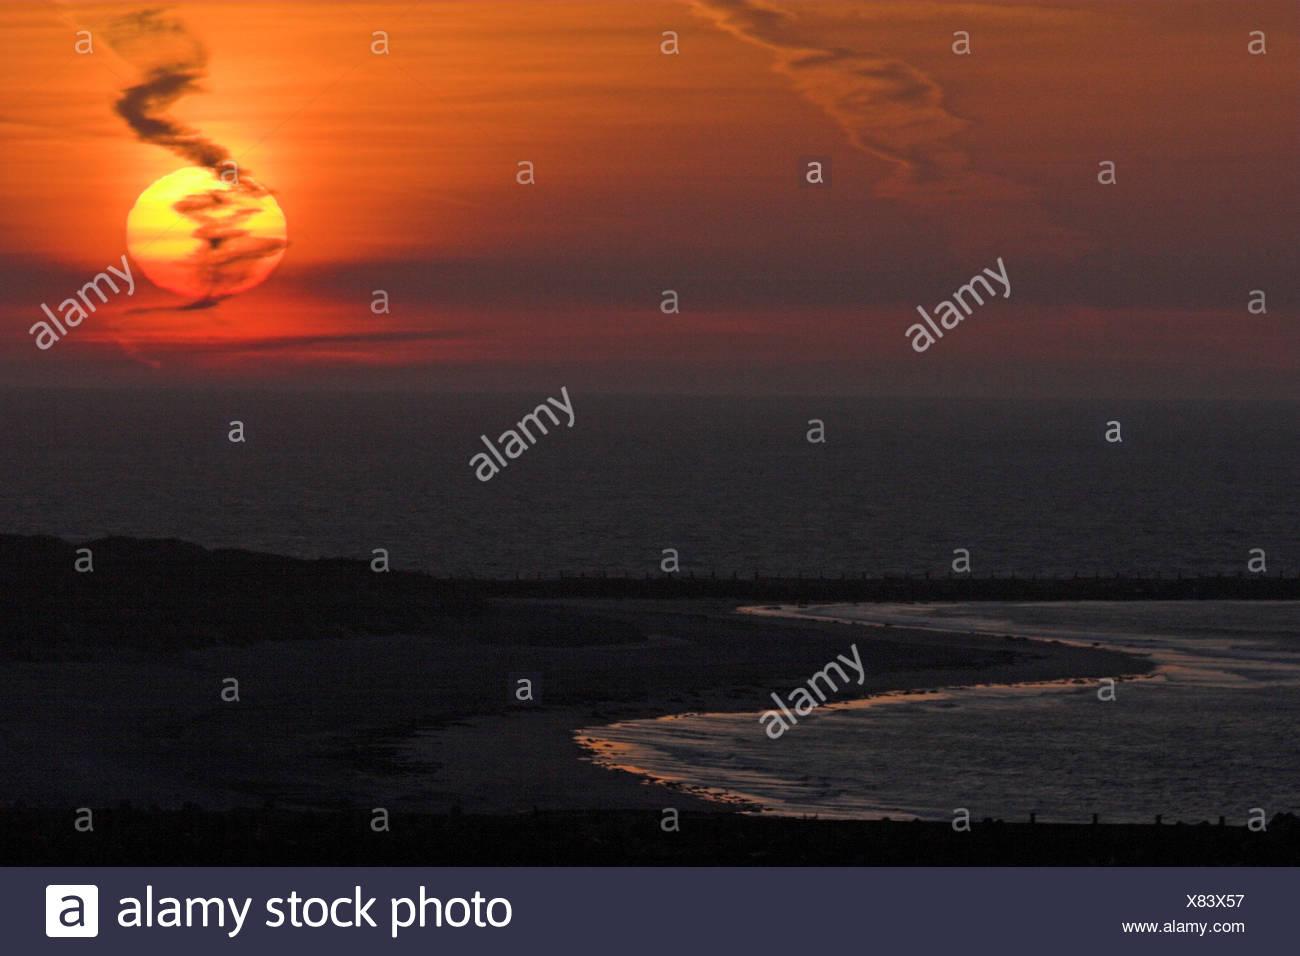 Sunrise Romantik Natur spielen Glut Helgoland Naturstimmung naturimpression Stockbild